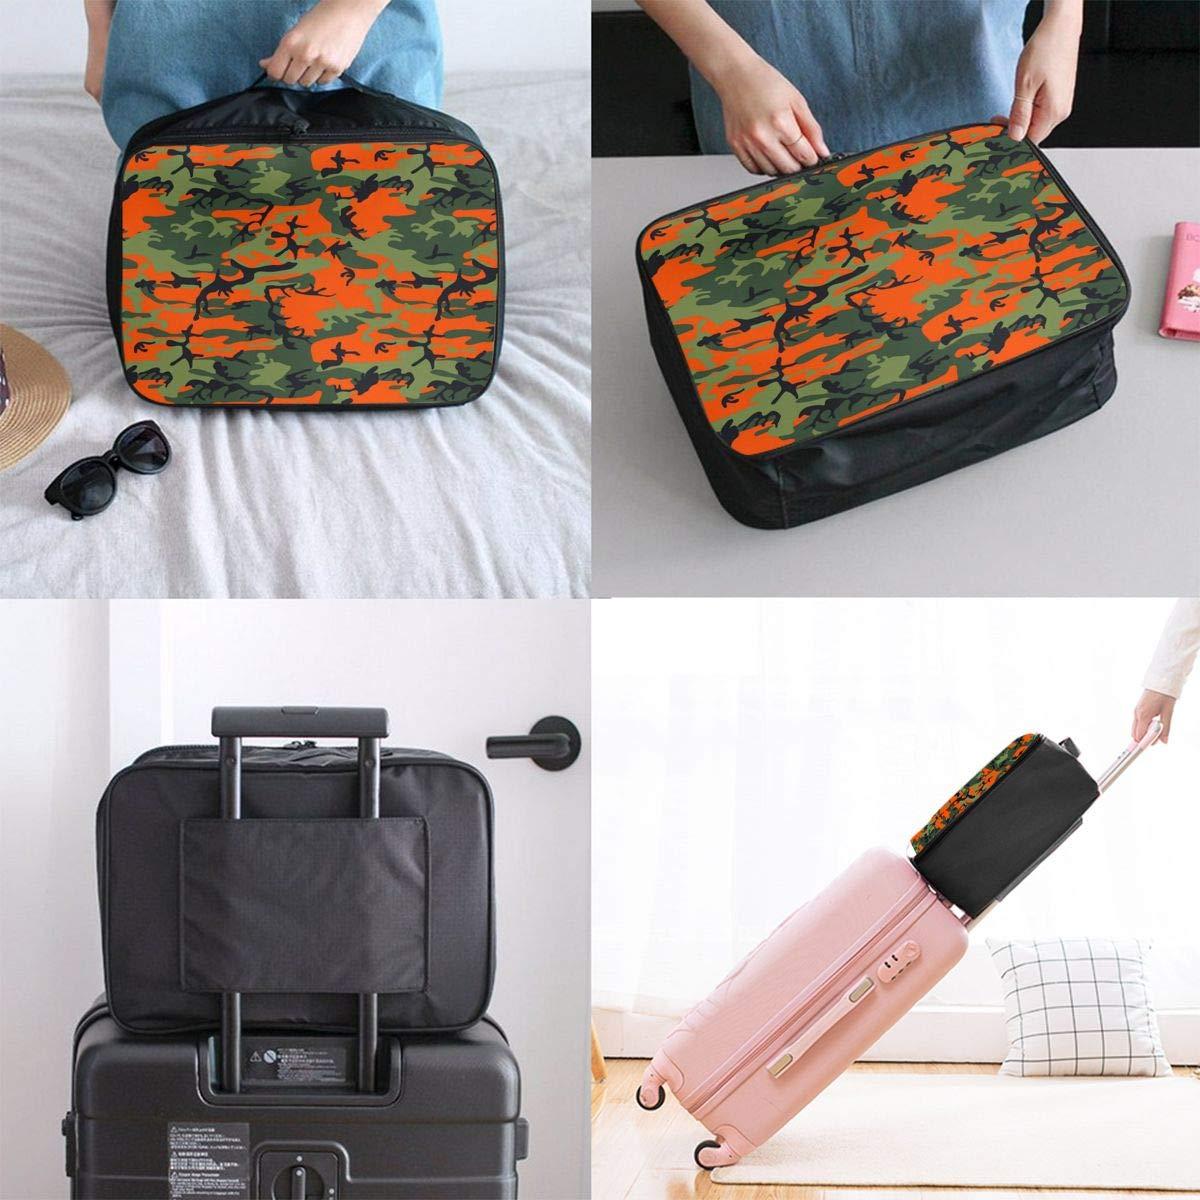 Travel Luggage Duffle Bag Lightweight Portable Handbag Orange Camouflage Print Large Capacity Waterproof Foldable Storage Tote